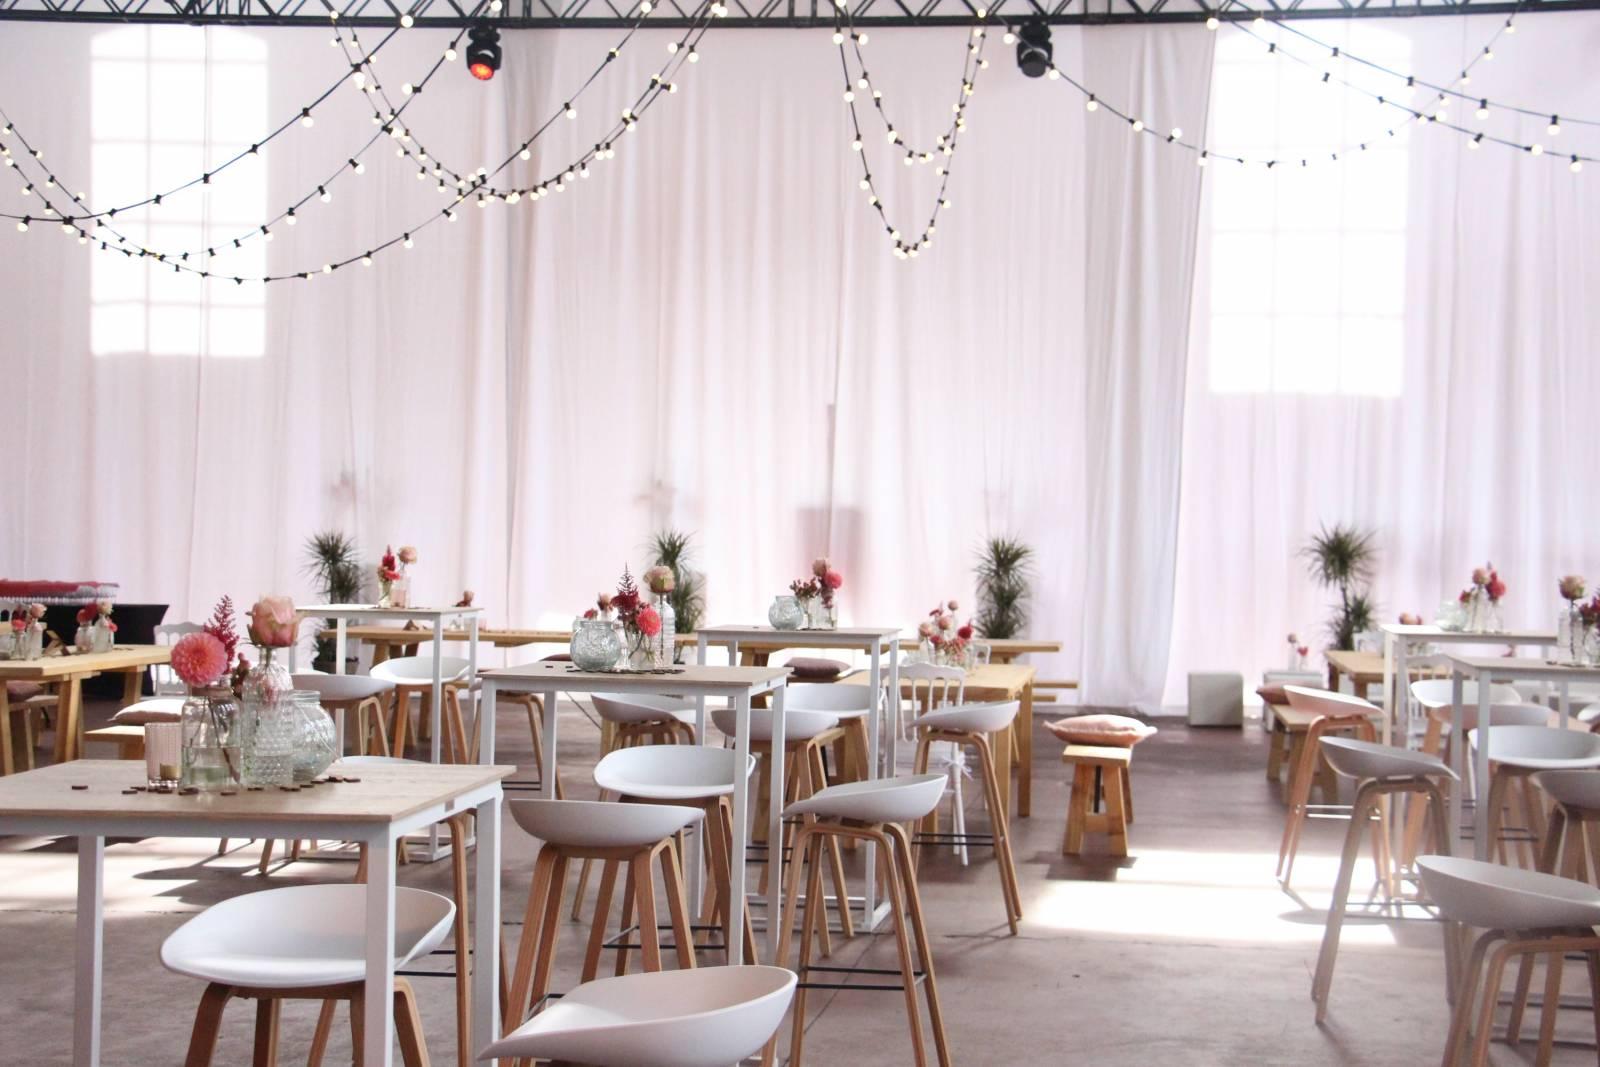 Hangar 43 - Feestzaal Oost-Vlaanderen - Industrieel - House of Weddings - 38